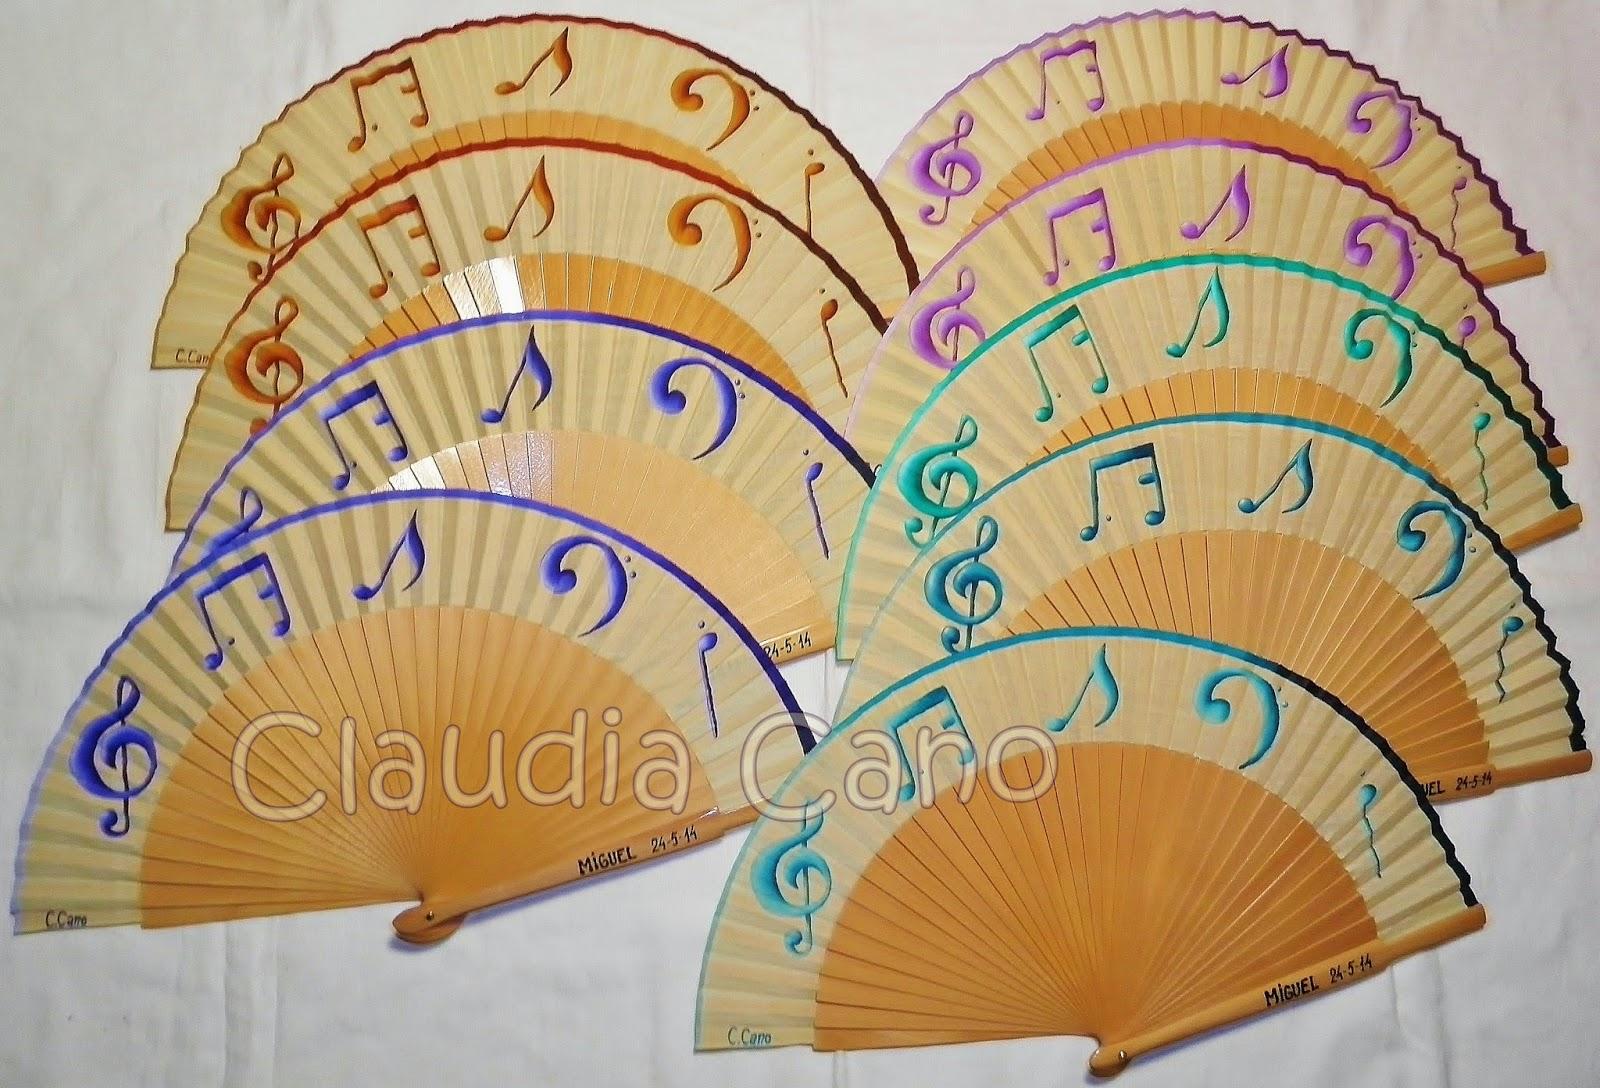 Abanicos para bodas y eventos claudia cano abanicos con notas musicales en madera natural para - Plantillas para pintar camisetas a mano ...